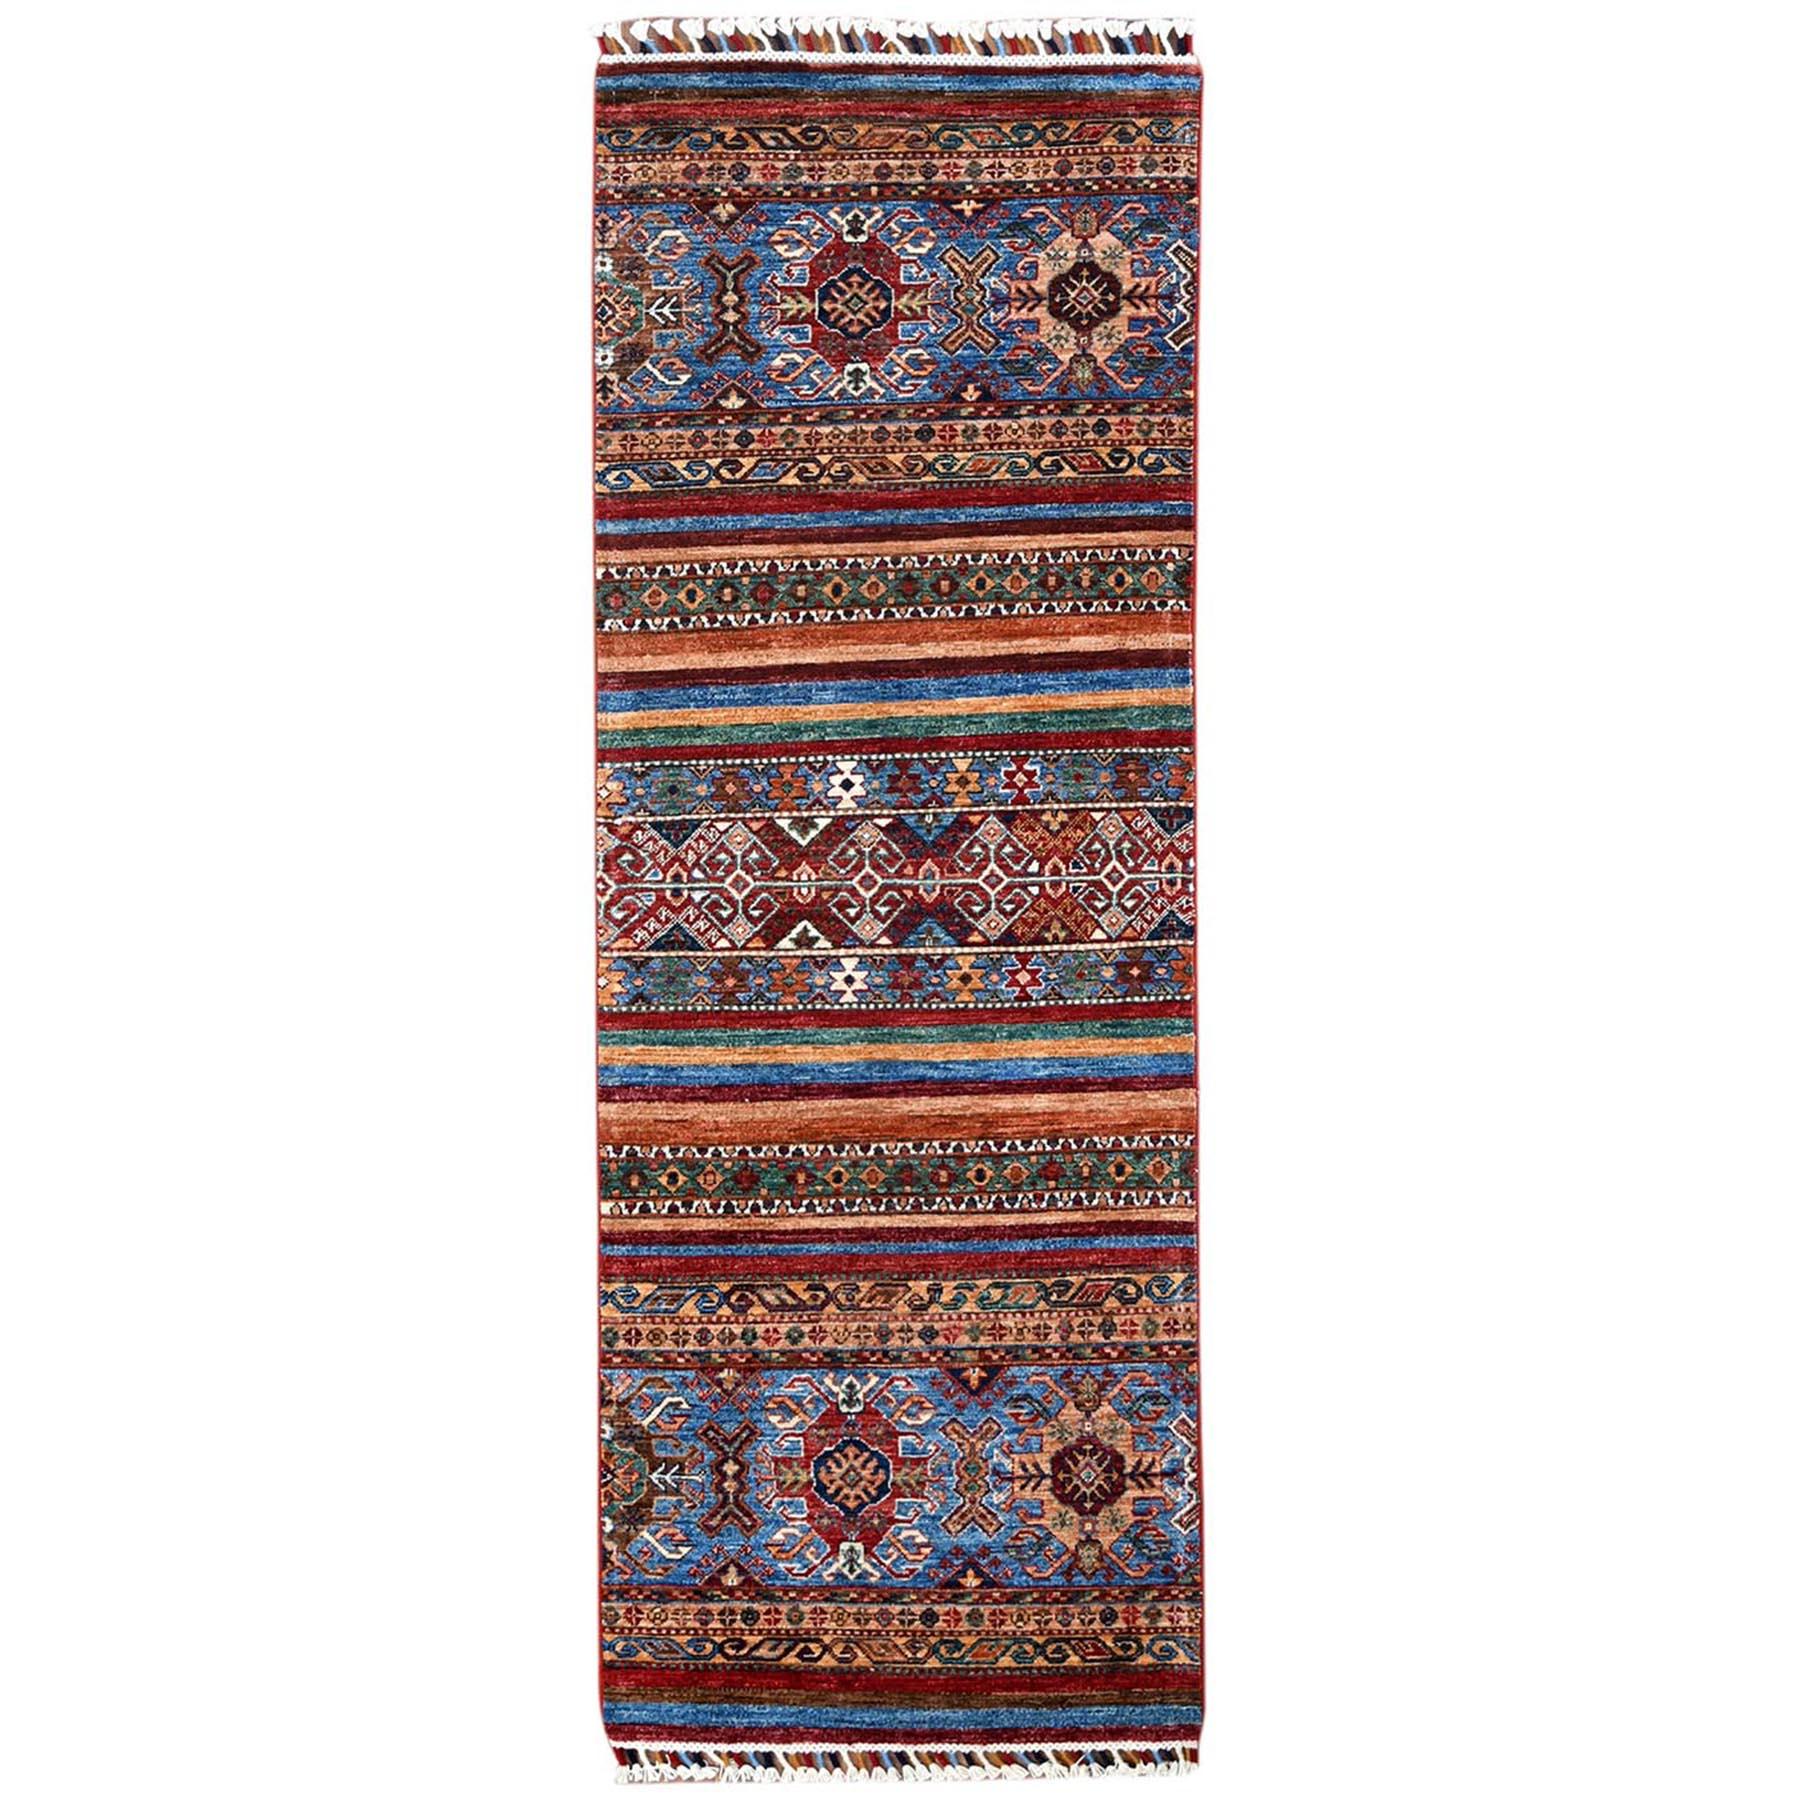 "2'5""X6'10"" Hand Knotted Red Super Kazak Khorjin Design With Colorful Tassles Natural Wool Oriental Runner Rug moa60bbd"